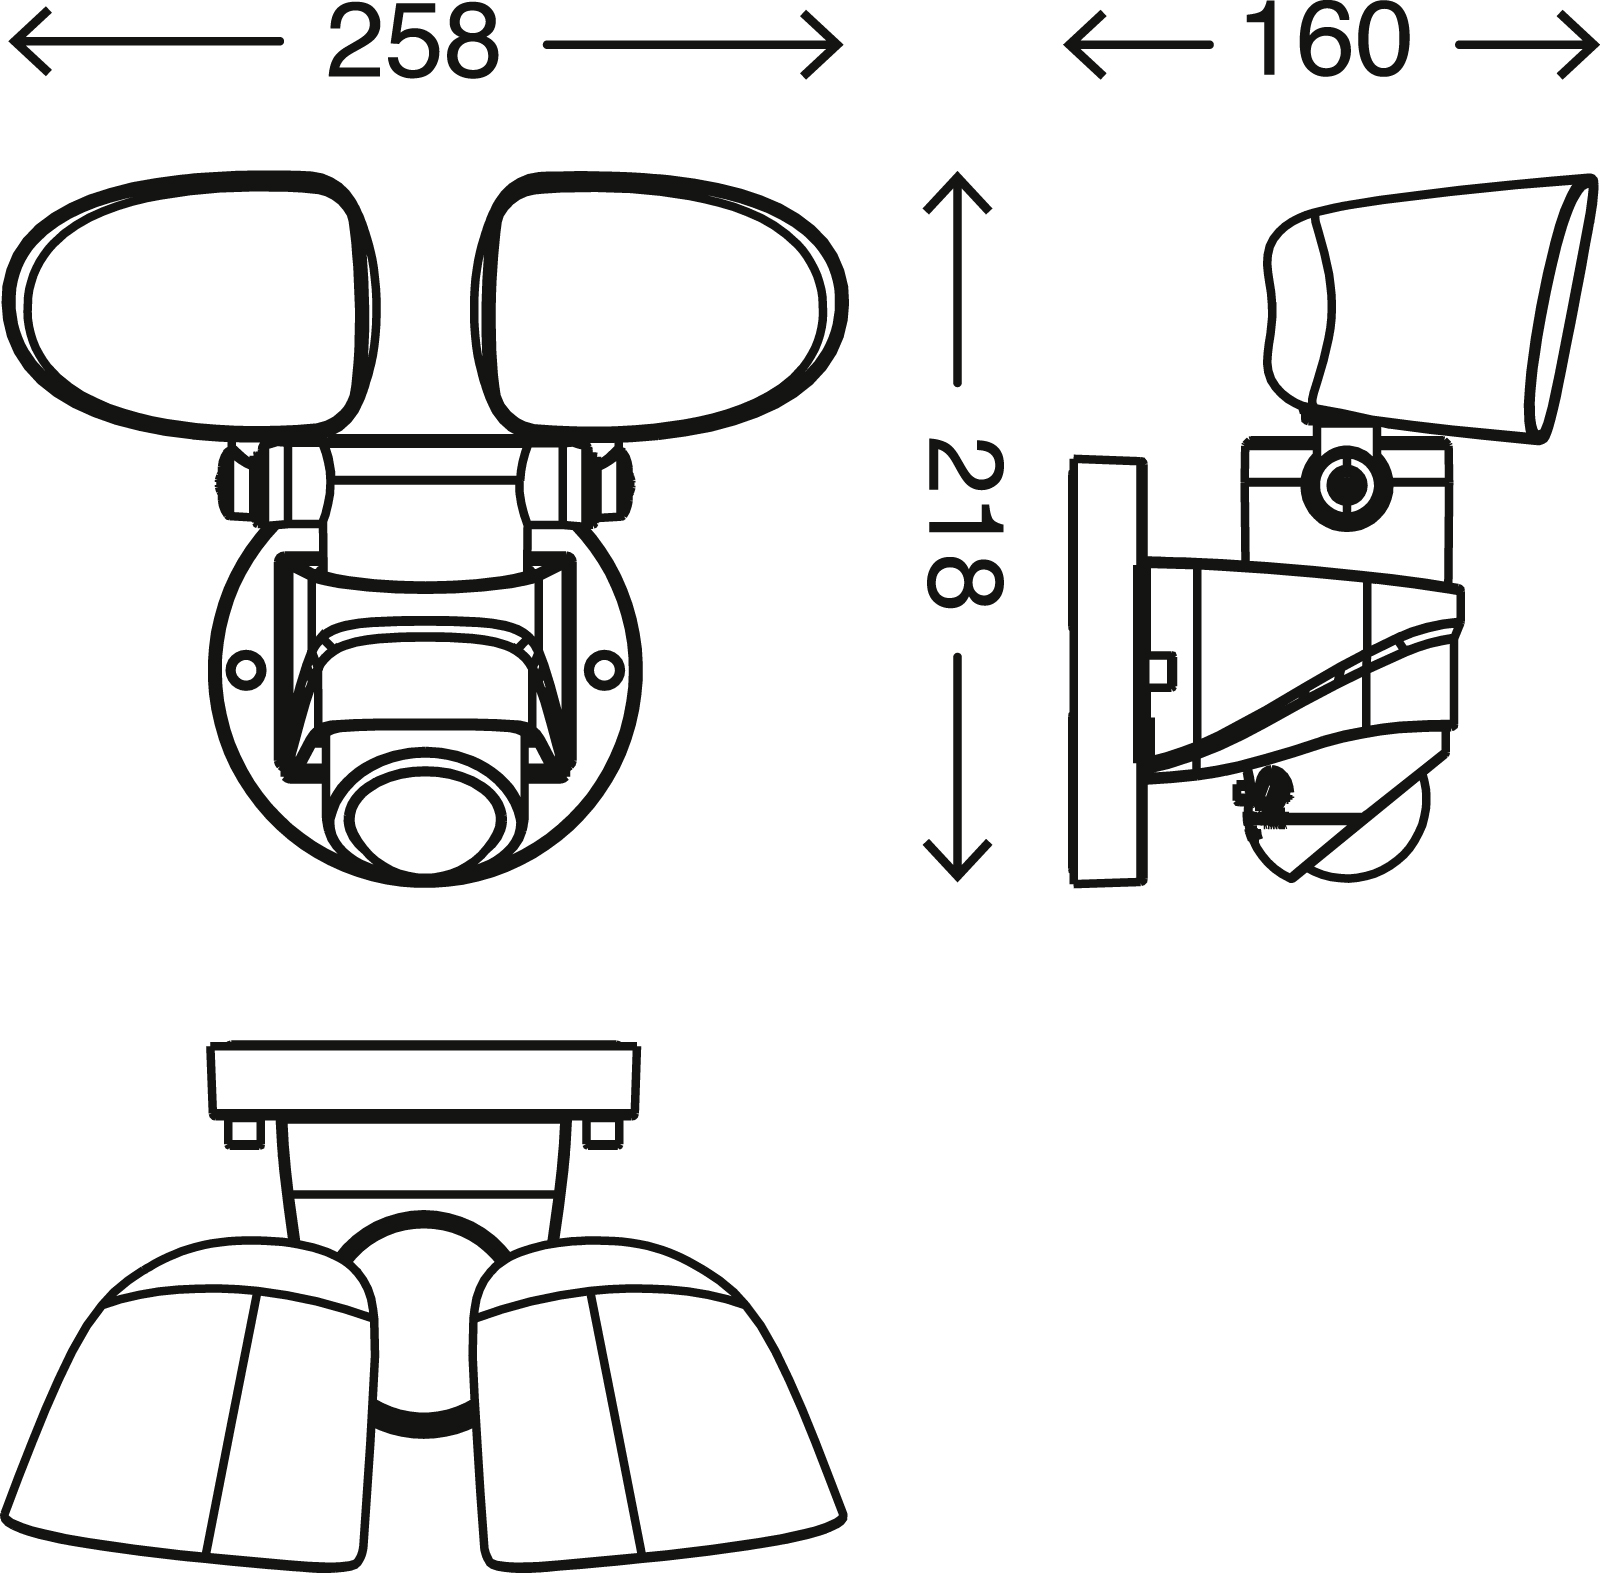 TELEFUNKEN LED Sensor Aussenleuchte, 21,8 cm, 20 W, Schwarz